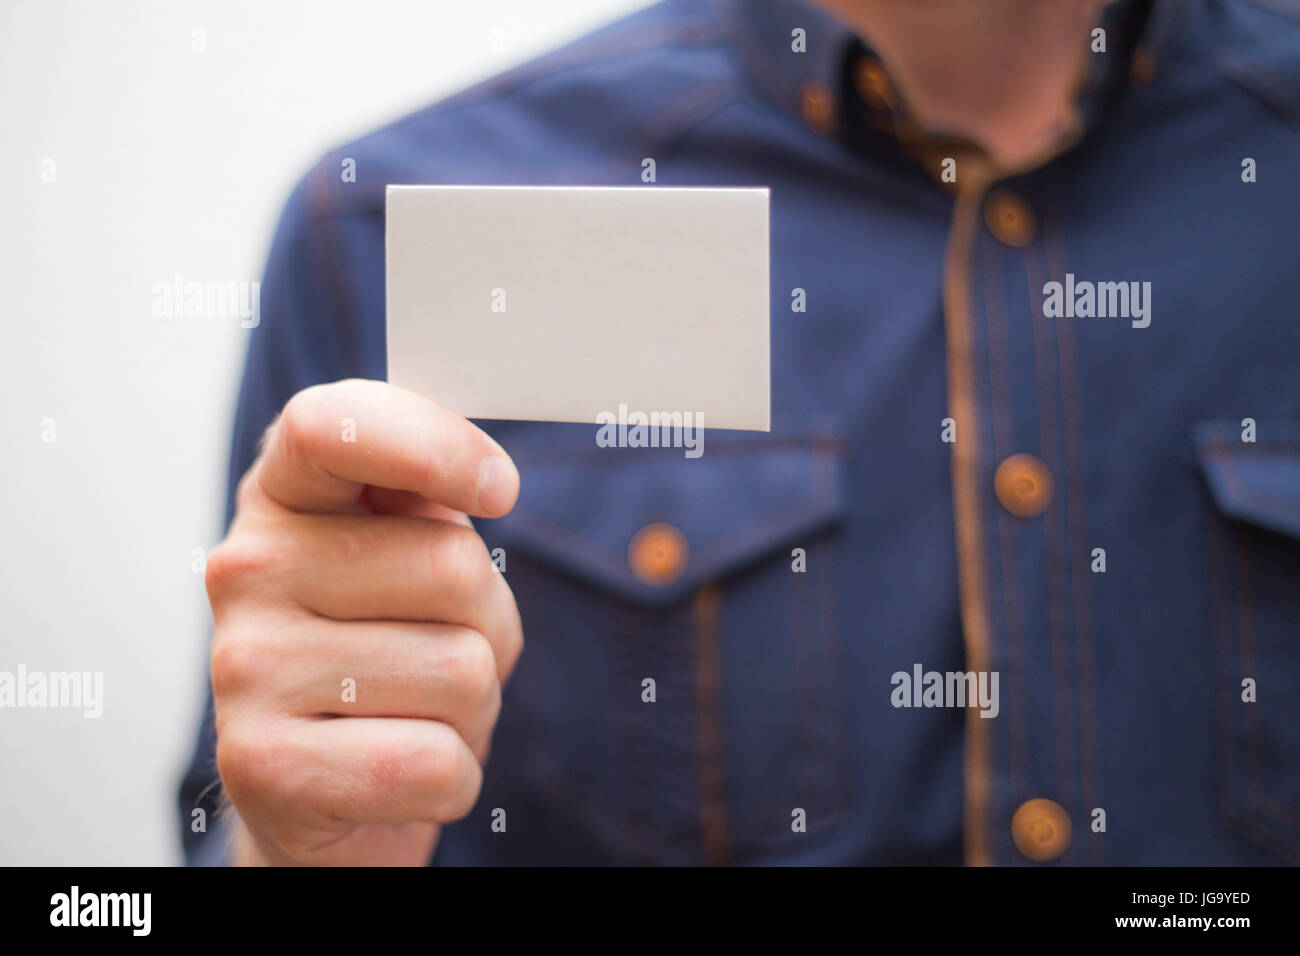 Bank card business card businessman holds card in hand finances bank card business card businessman holds card in hand finances jobs magicingreecefo Choice Image